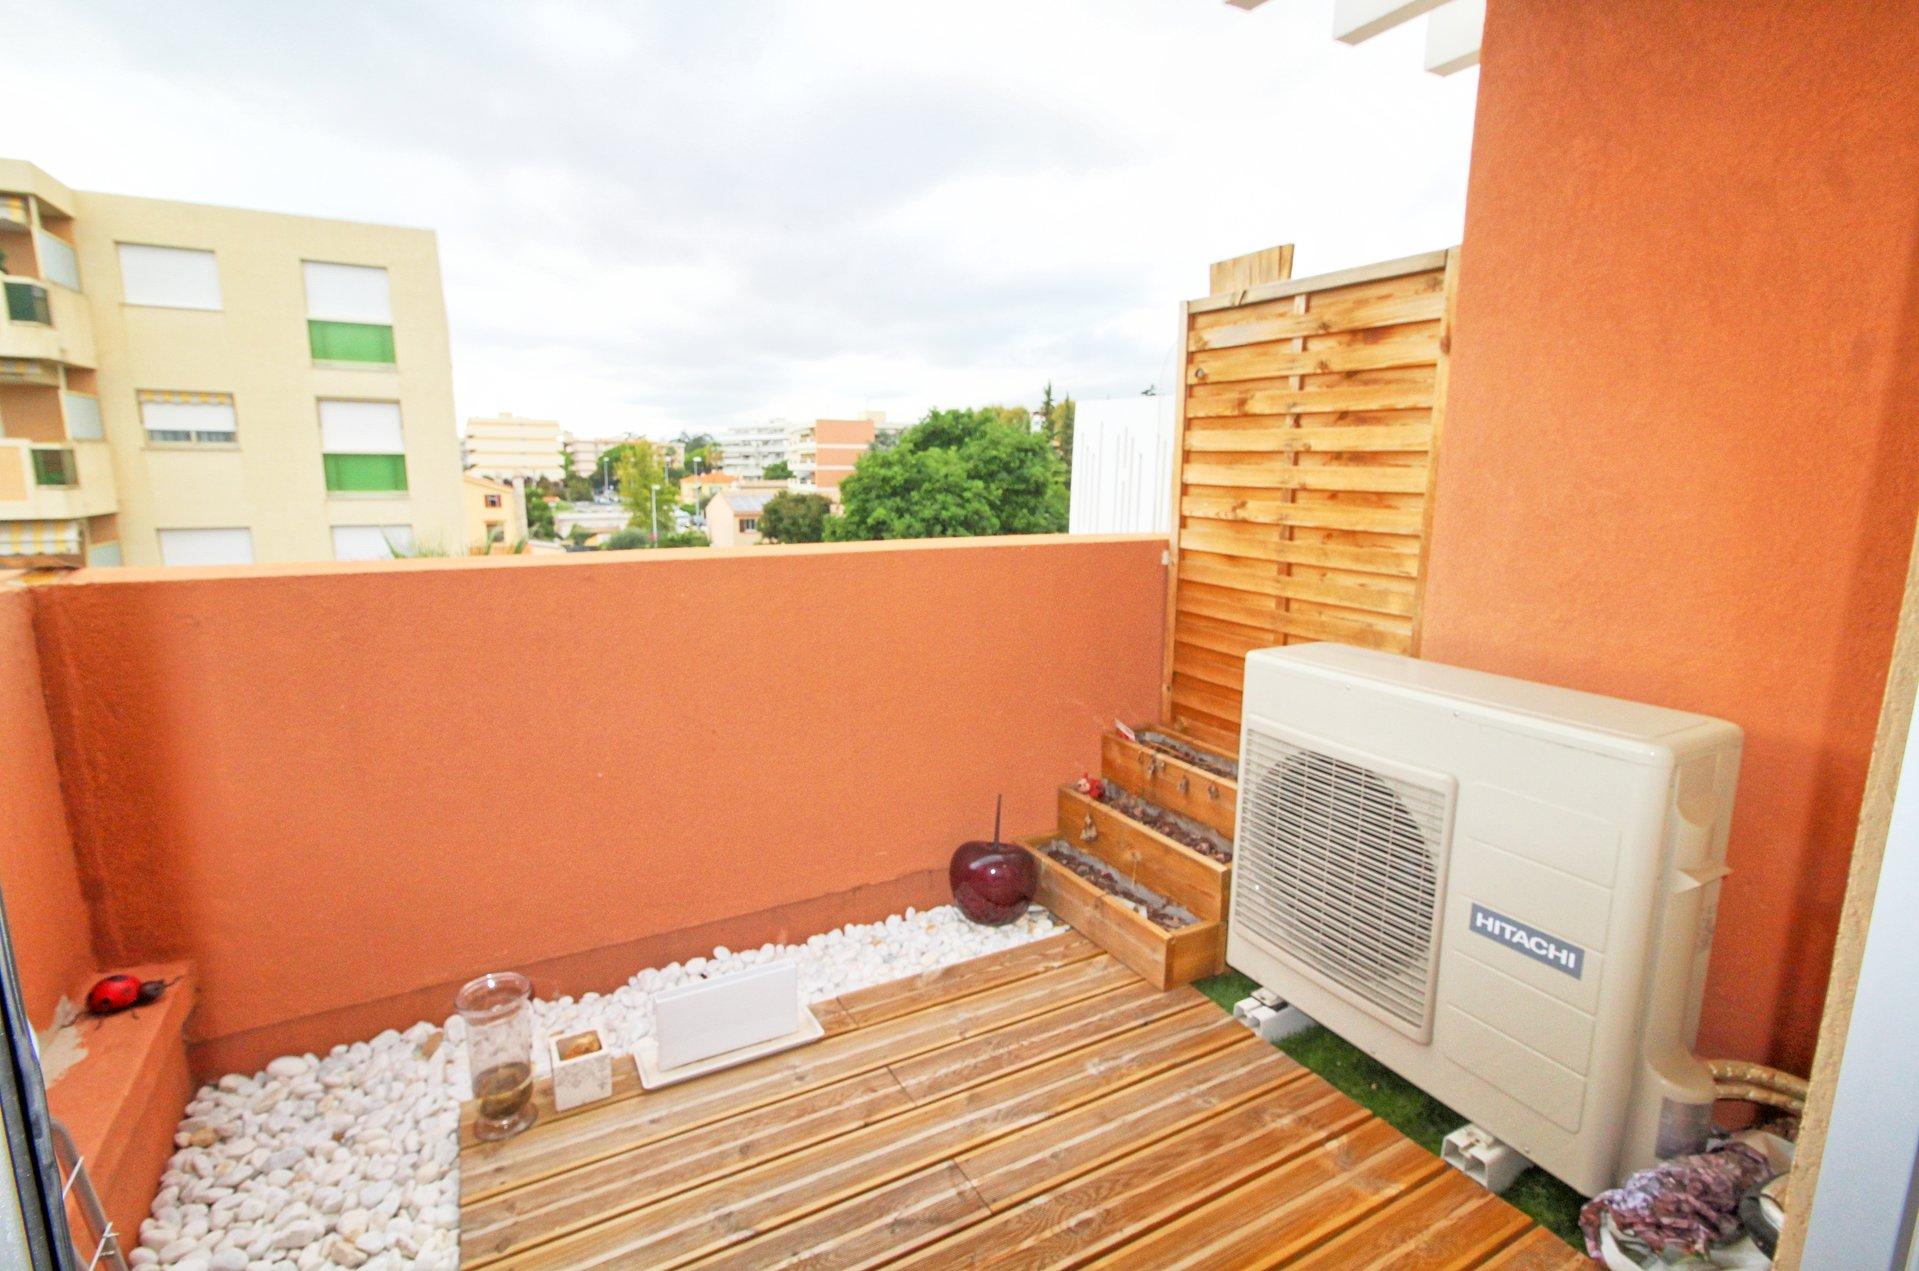 terrasse, st laurent, duplex, F3, balcon, cave